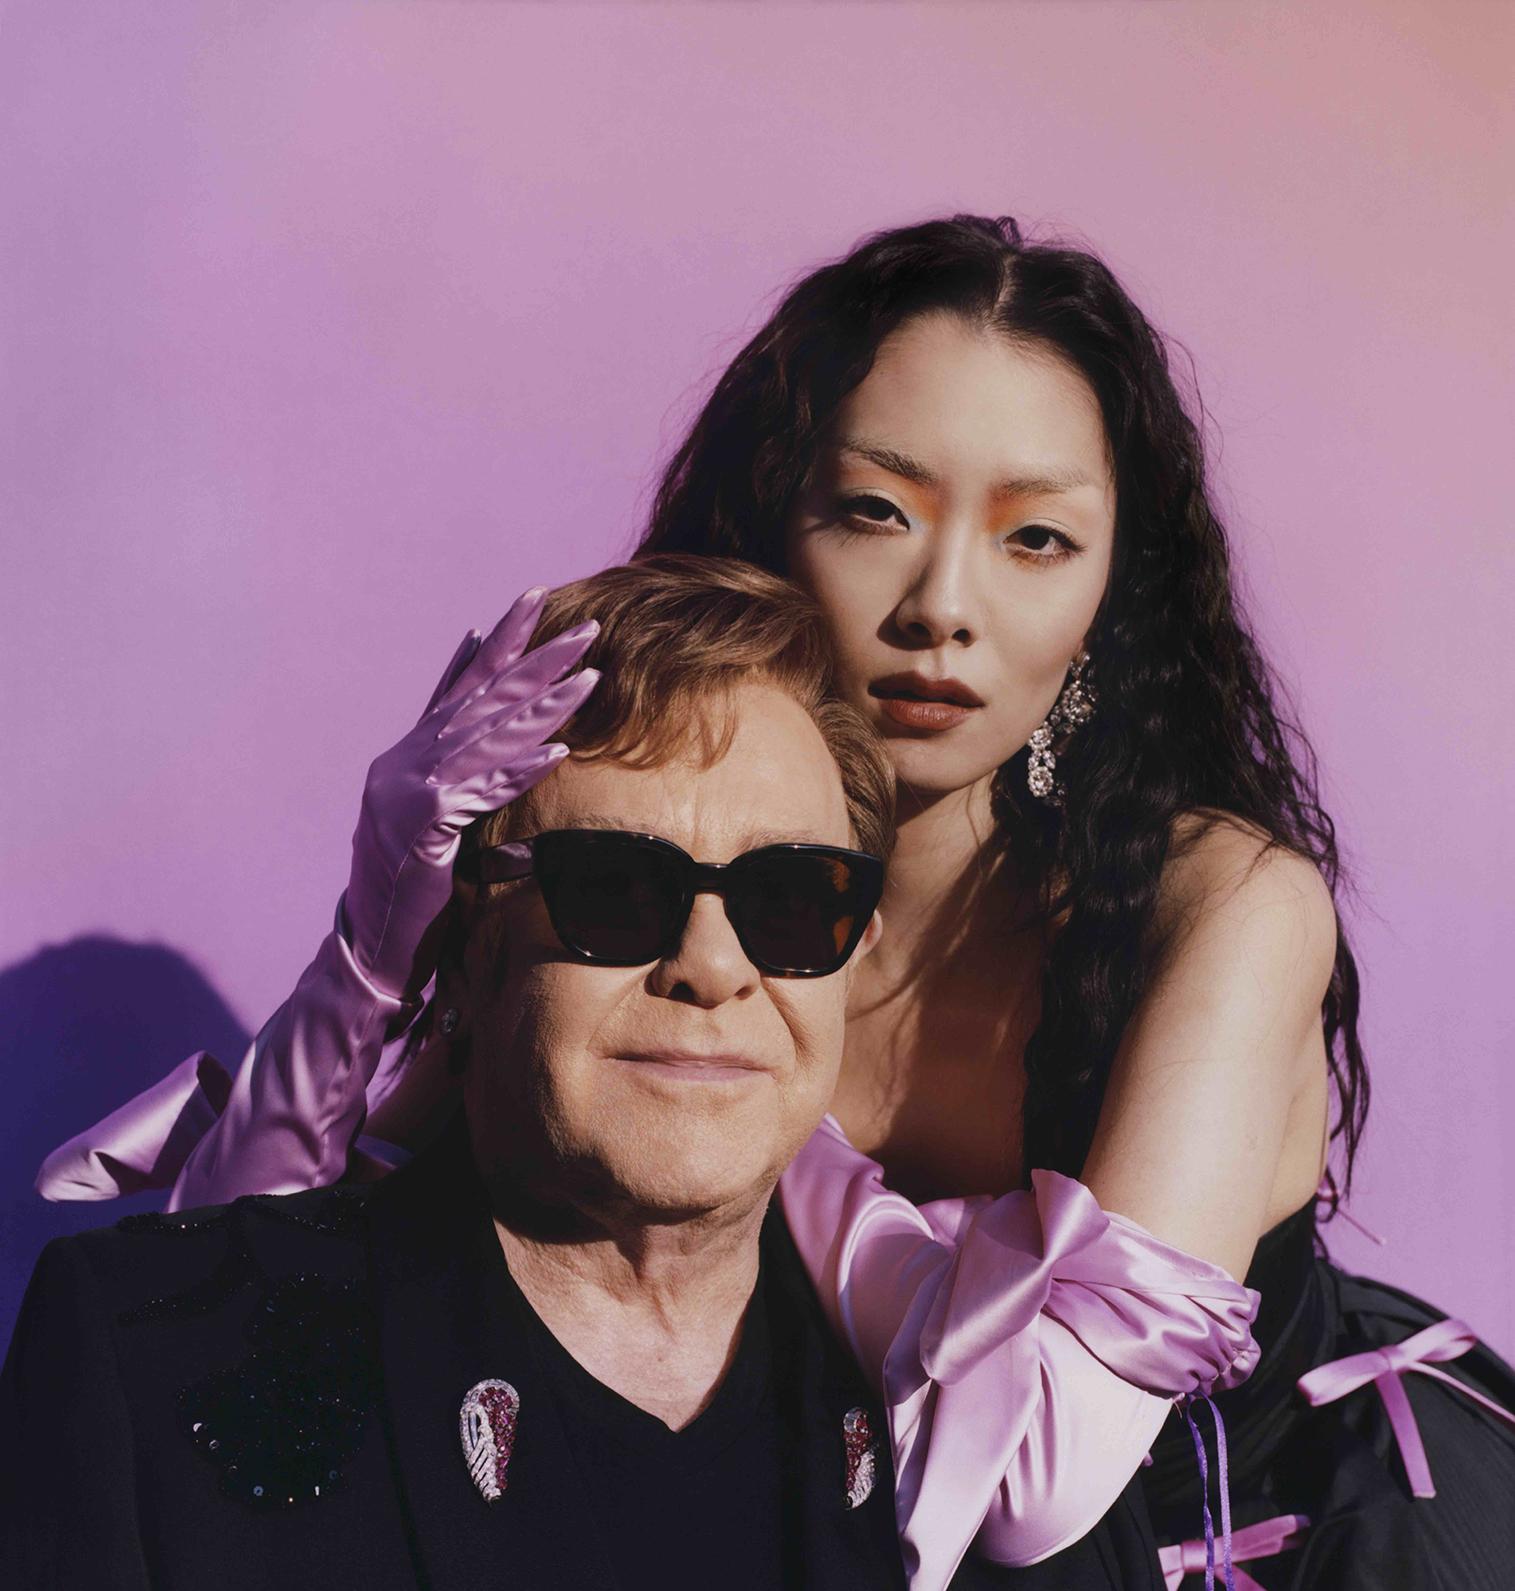 RINA SAWAYAMA releases new single 'Chosen Family' feat Elton John